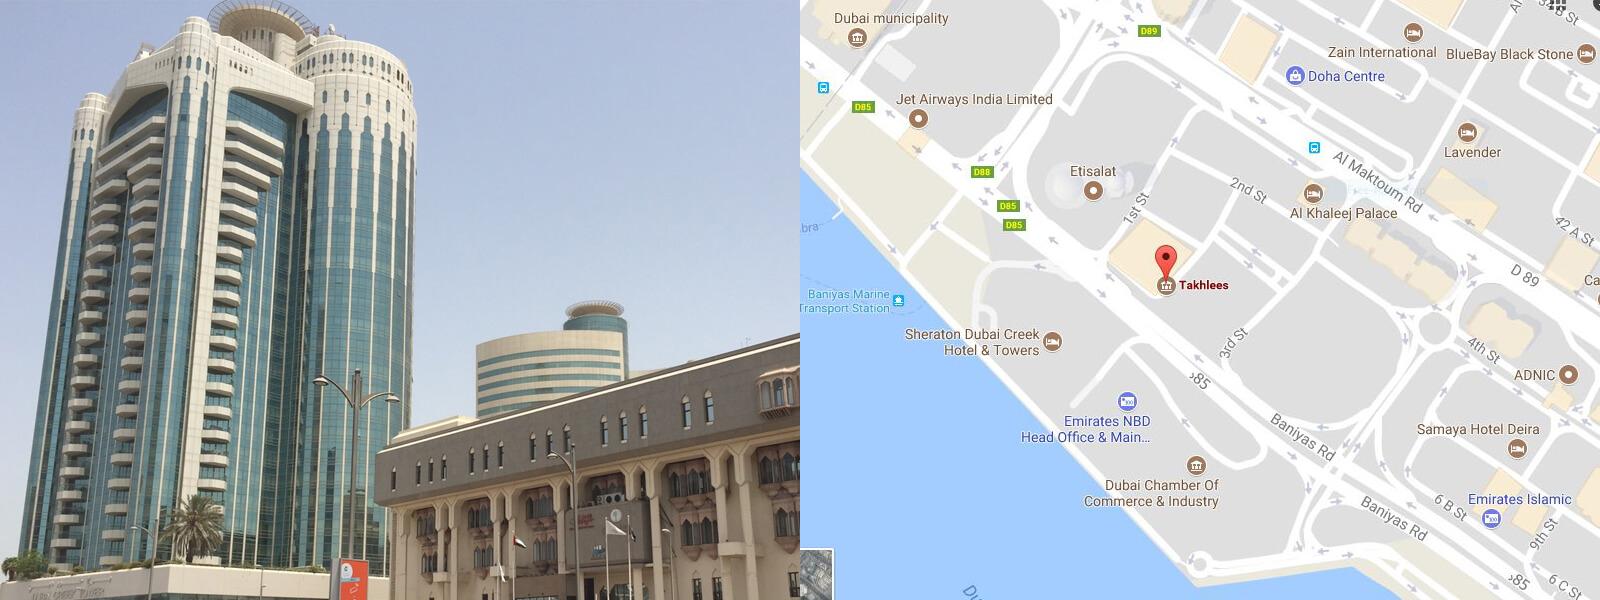 Takhlees Government Services - Dubai, UAE